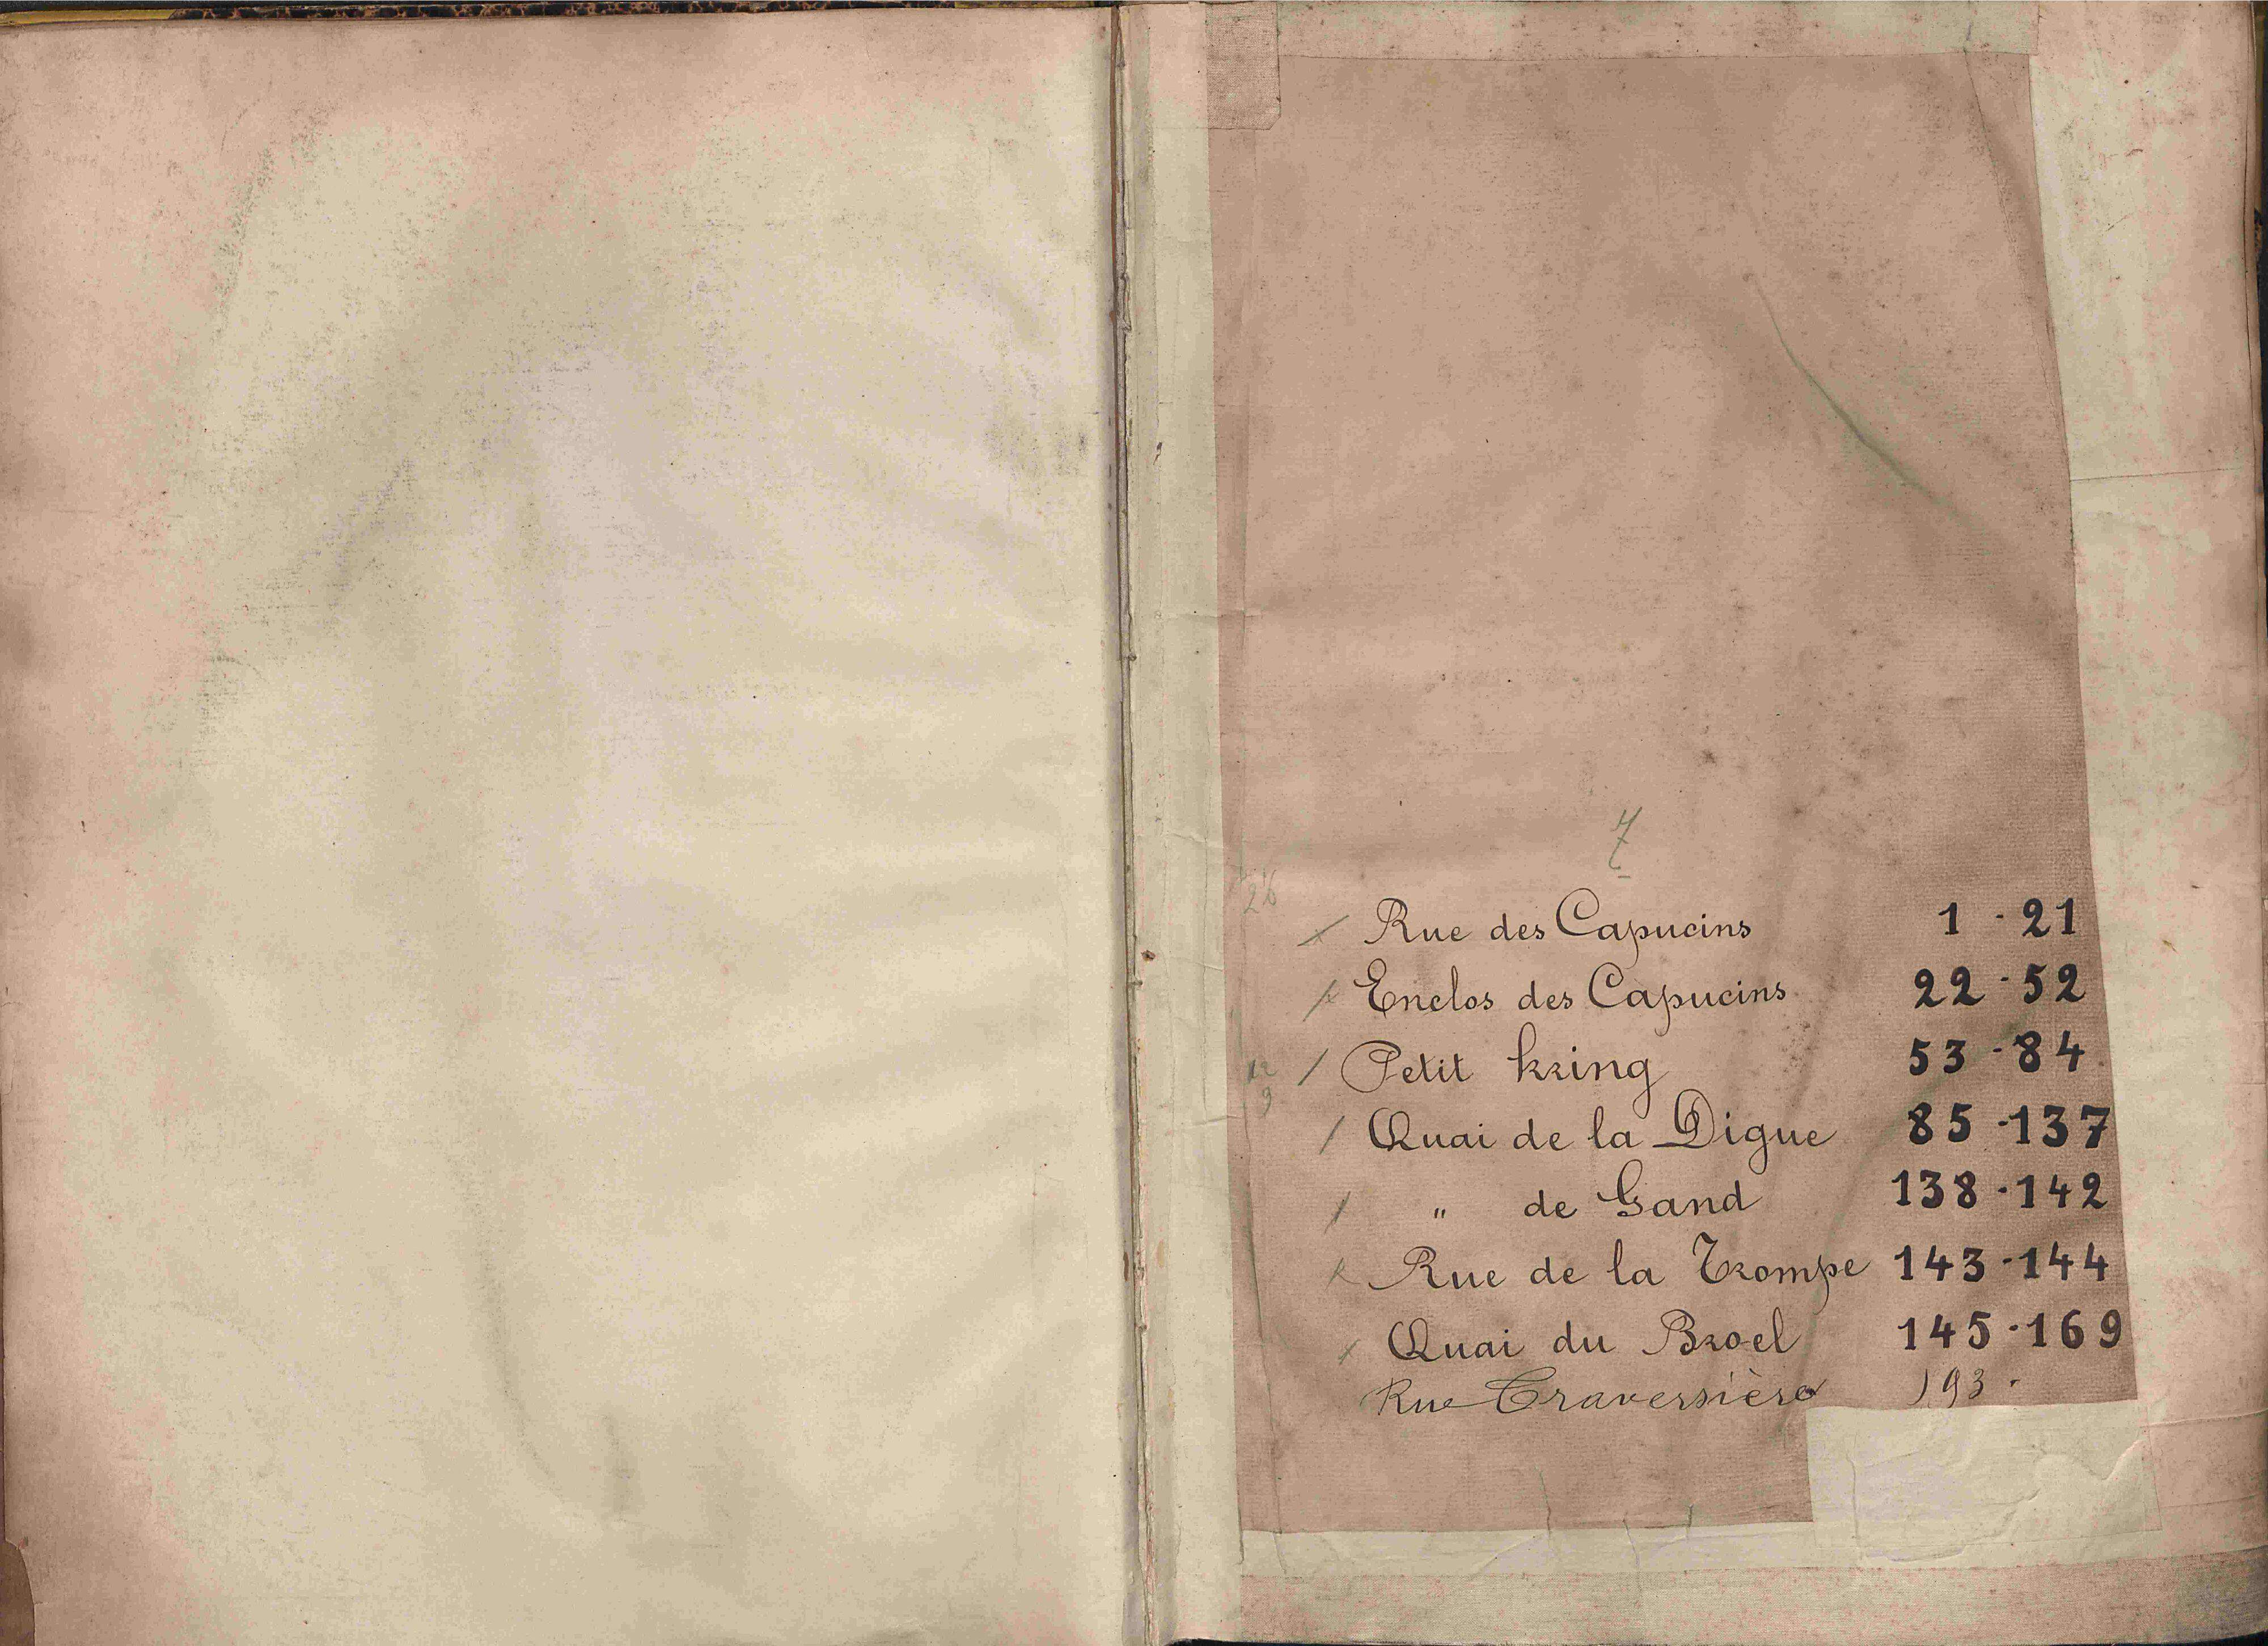 Bevolkingsregister Kortrijk 1890 boek 7